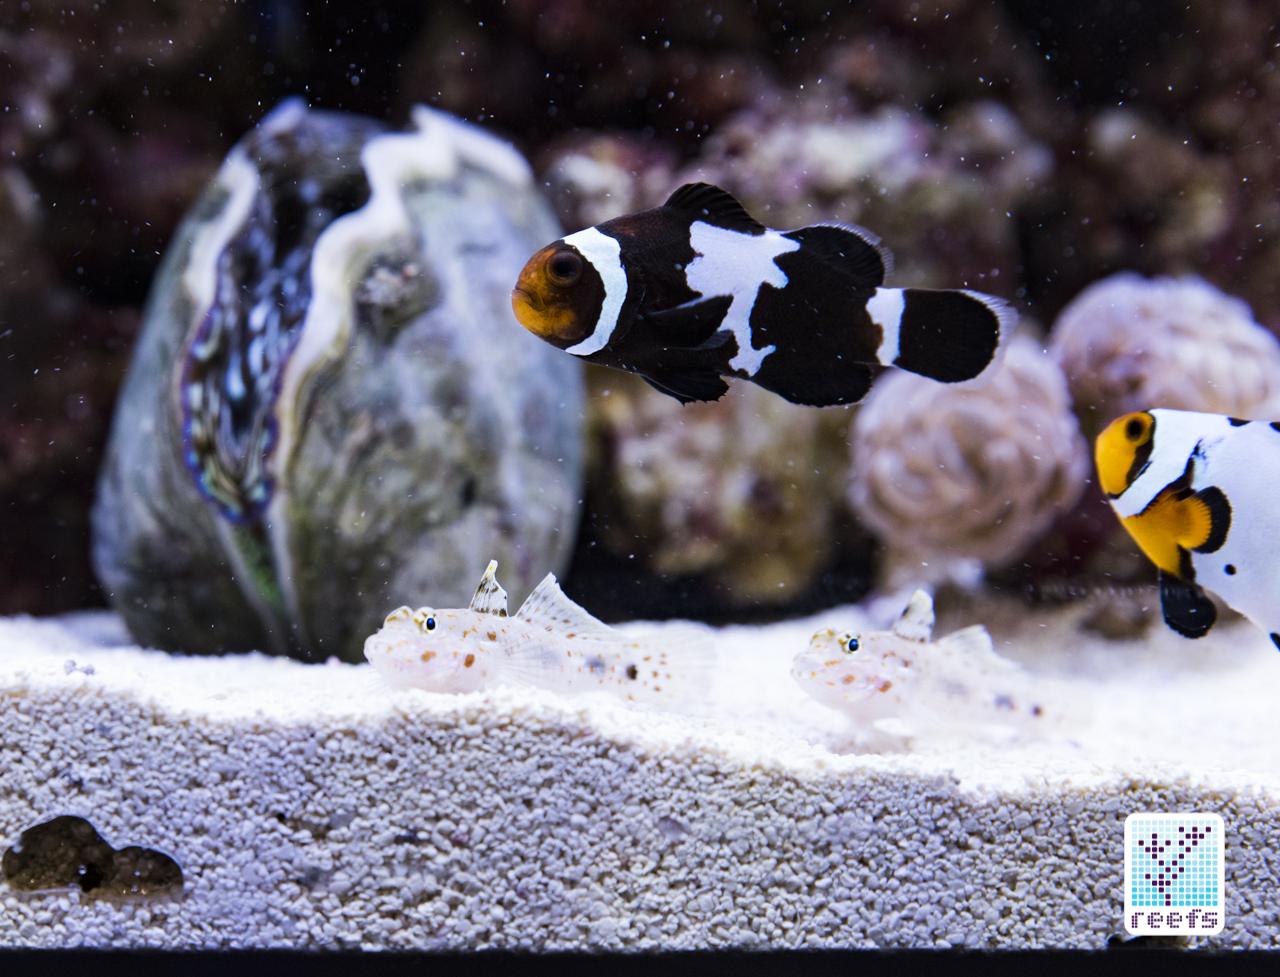 ORA maroon clownfish